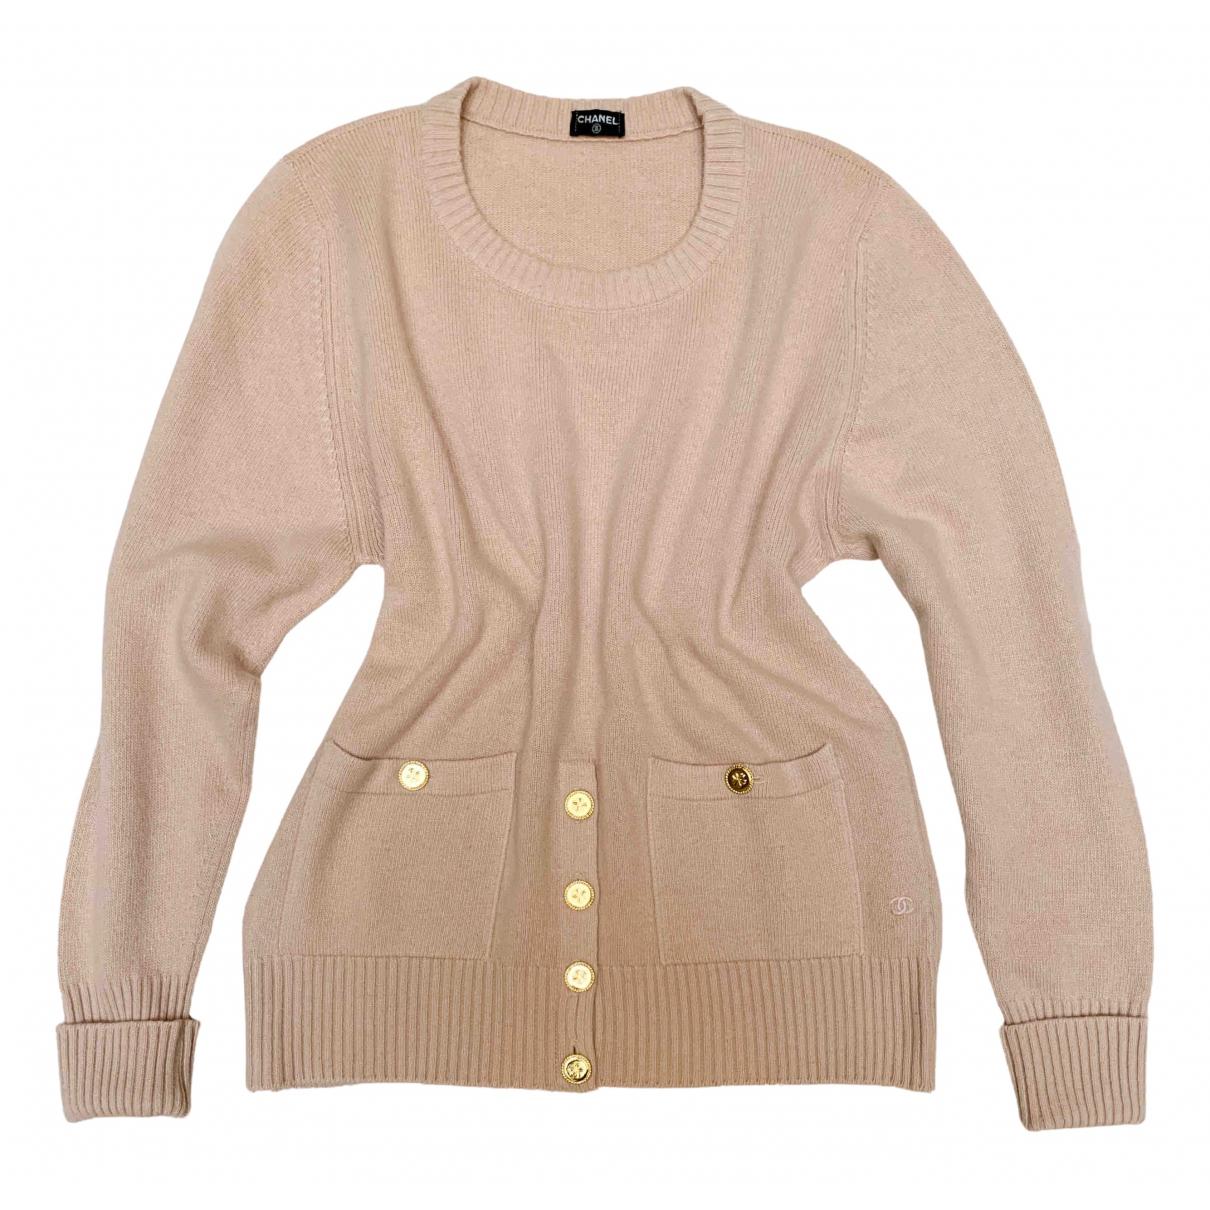 Chanel N Pink Cashmere Knitwear for Women 40 FR